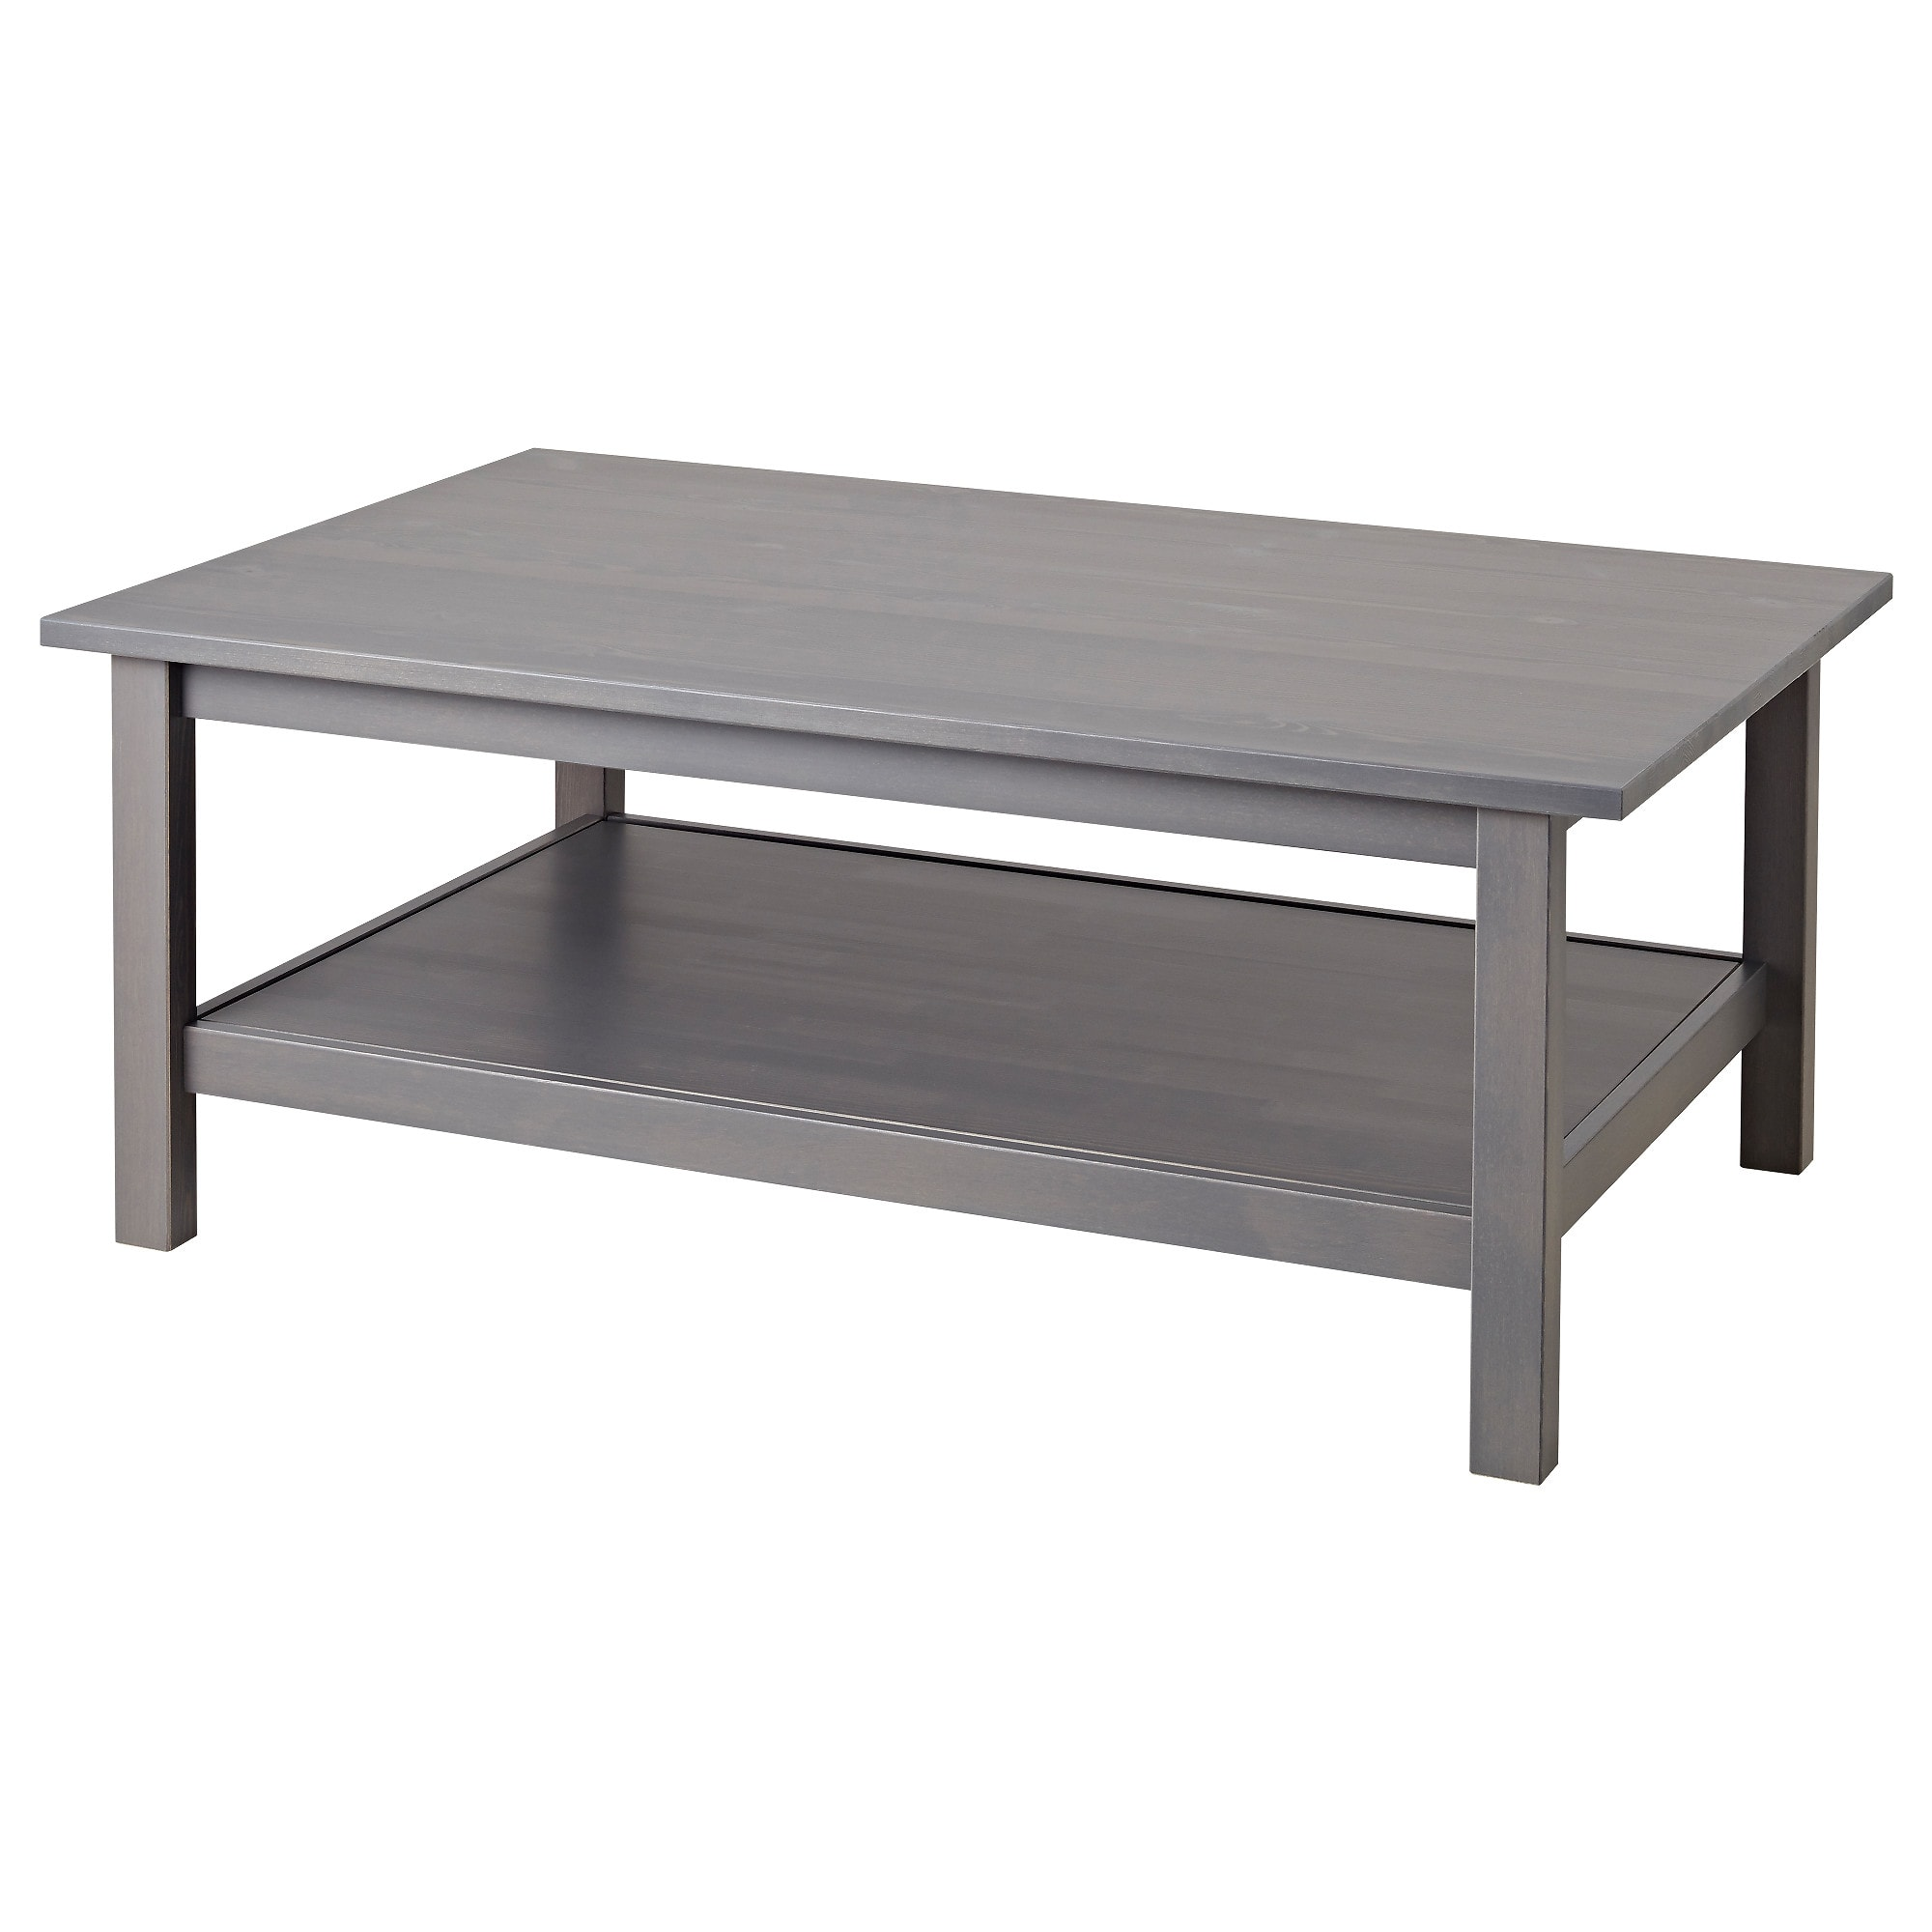 IKEA HEMNES Coffee Table Grey Brown